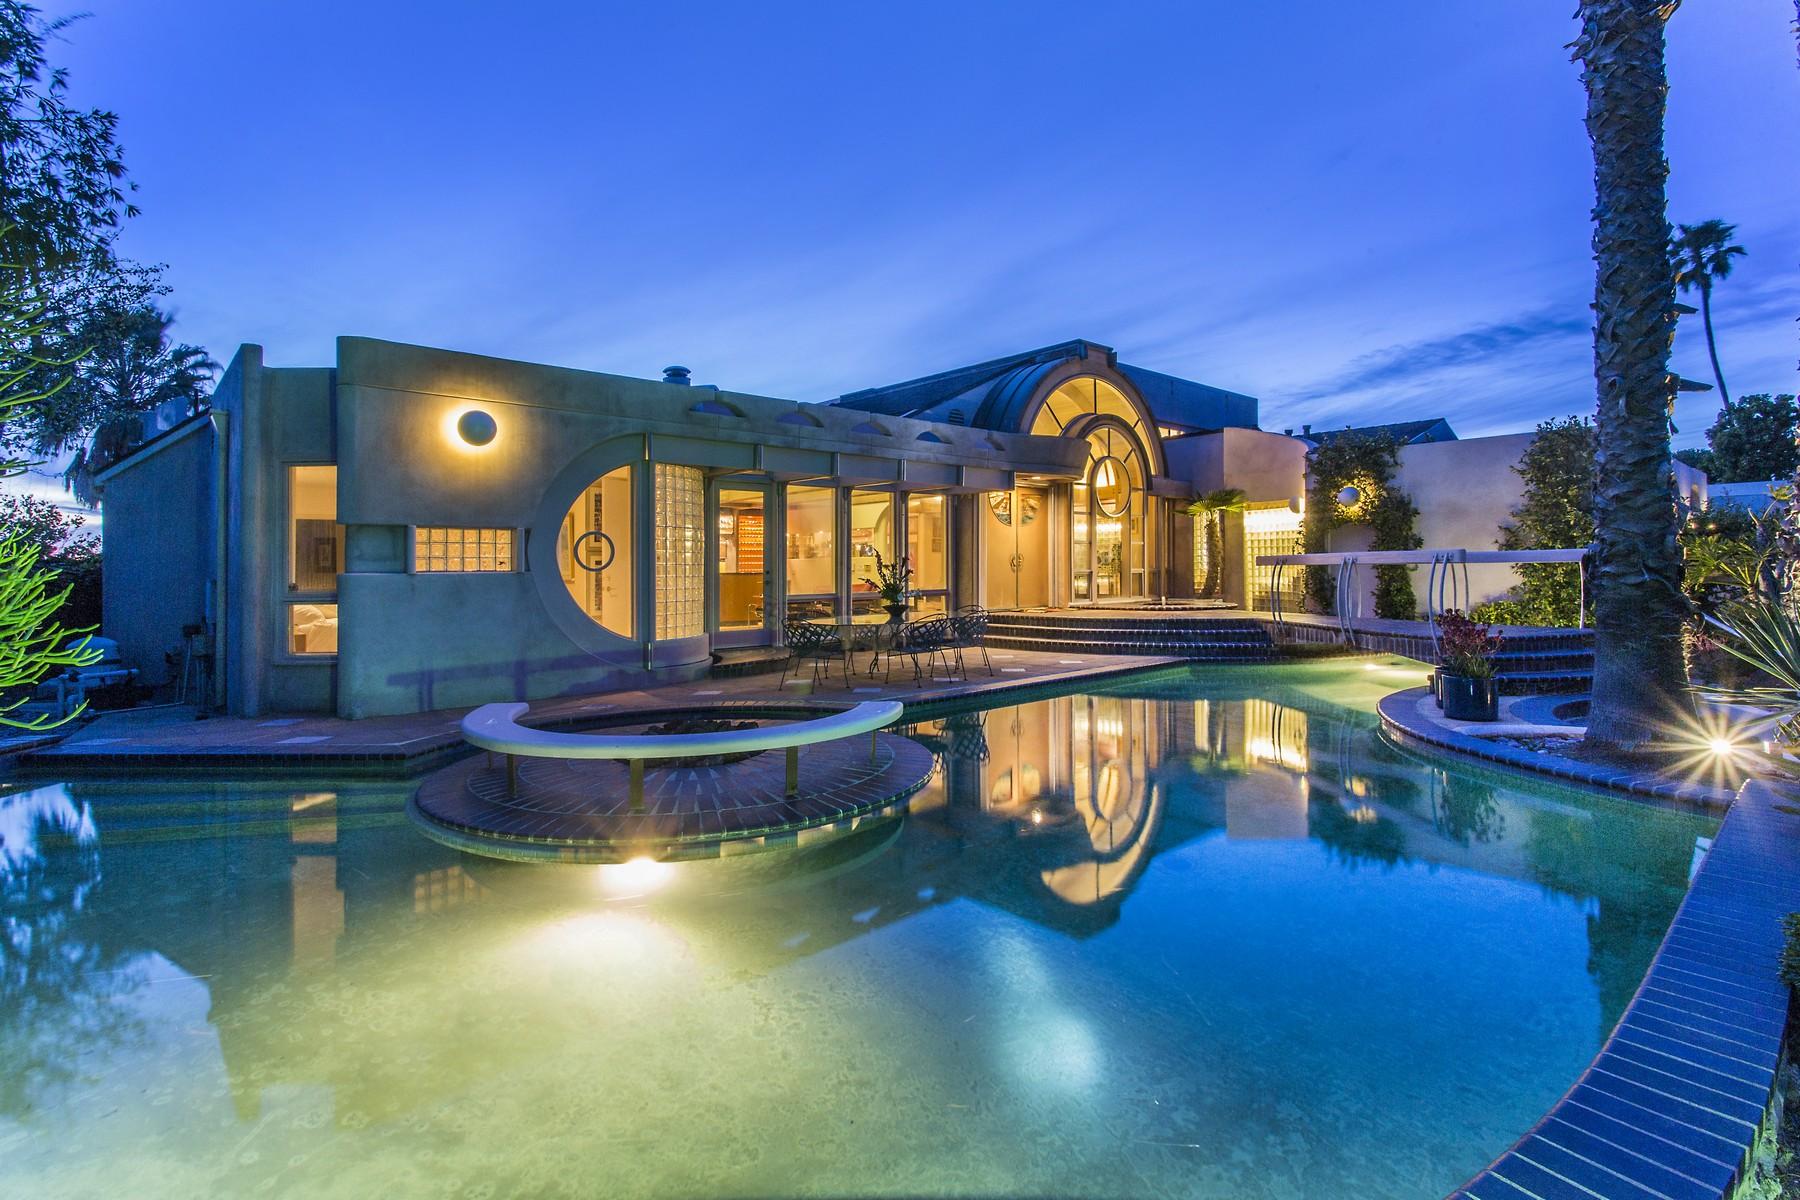 Single Family Home for Active at 7191 Encelia Dr 7191 Encelia Dr La Jolla, California 92037 United States